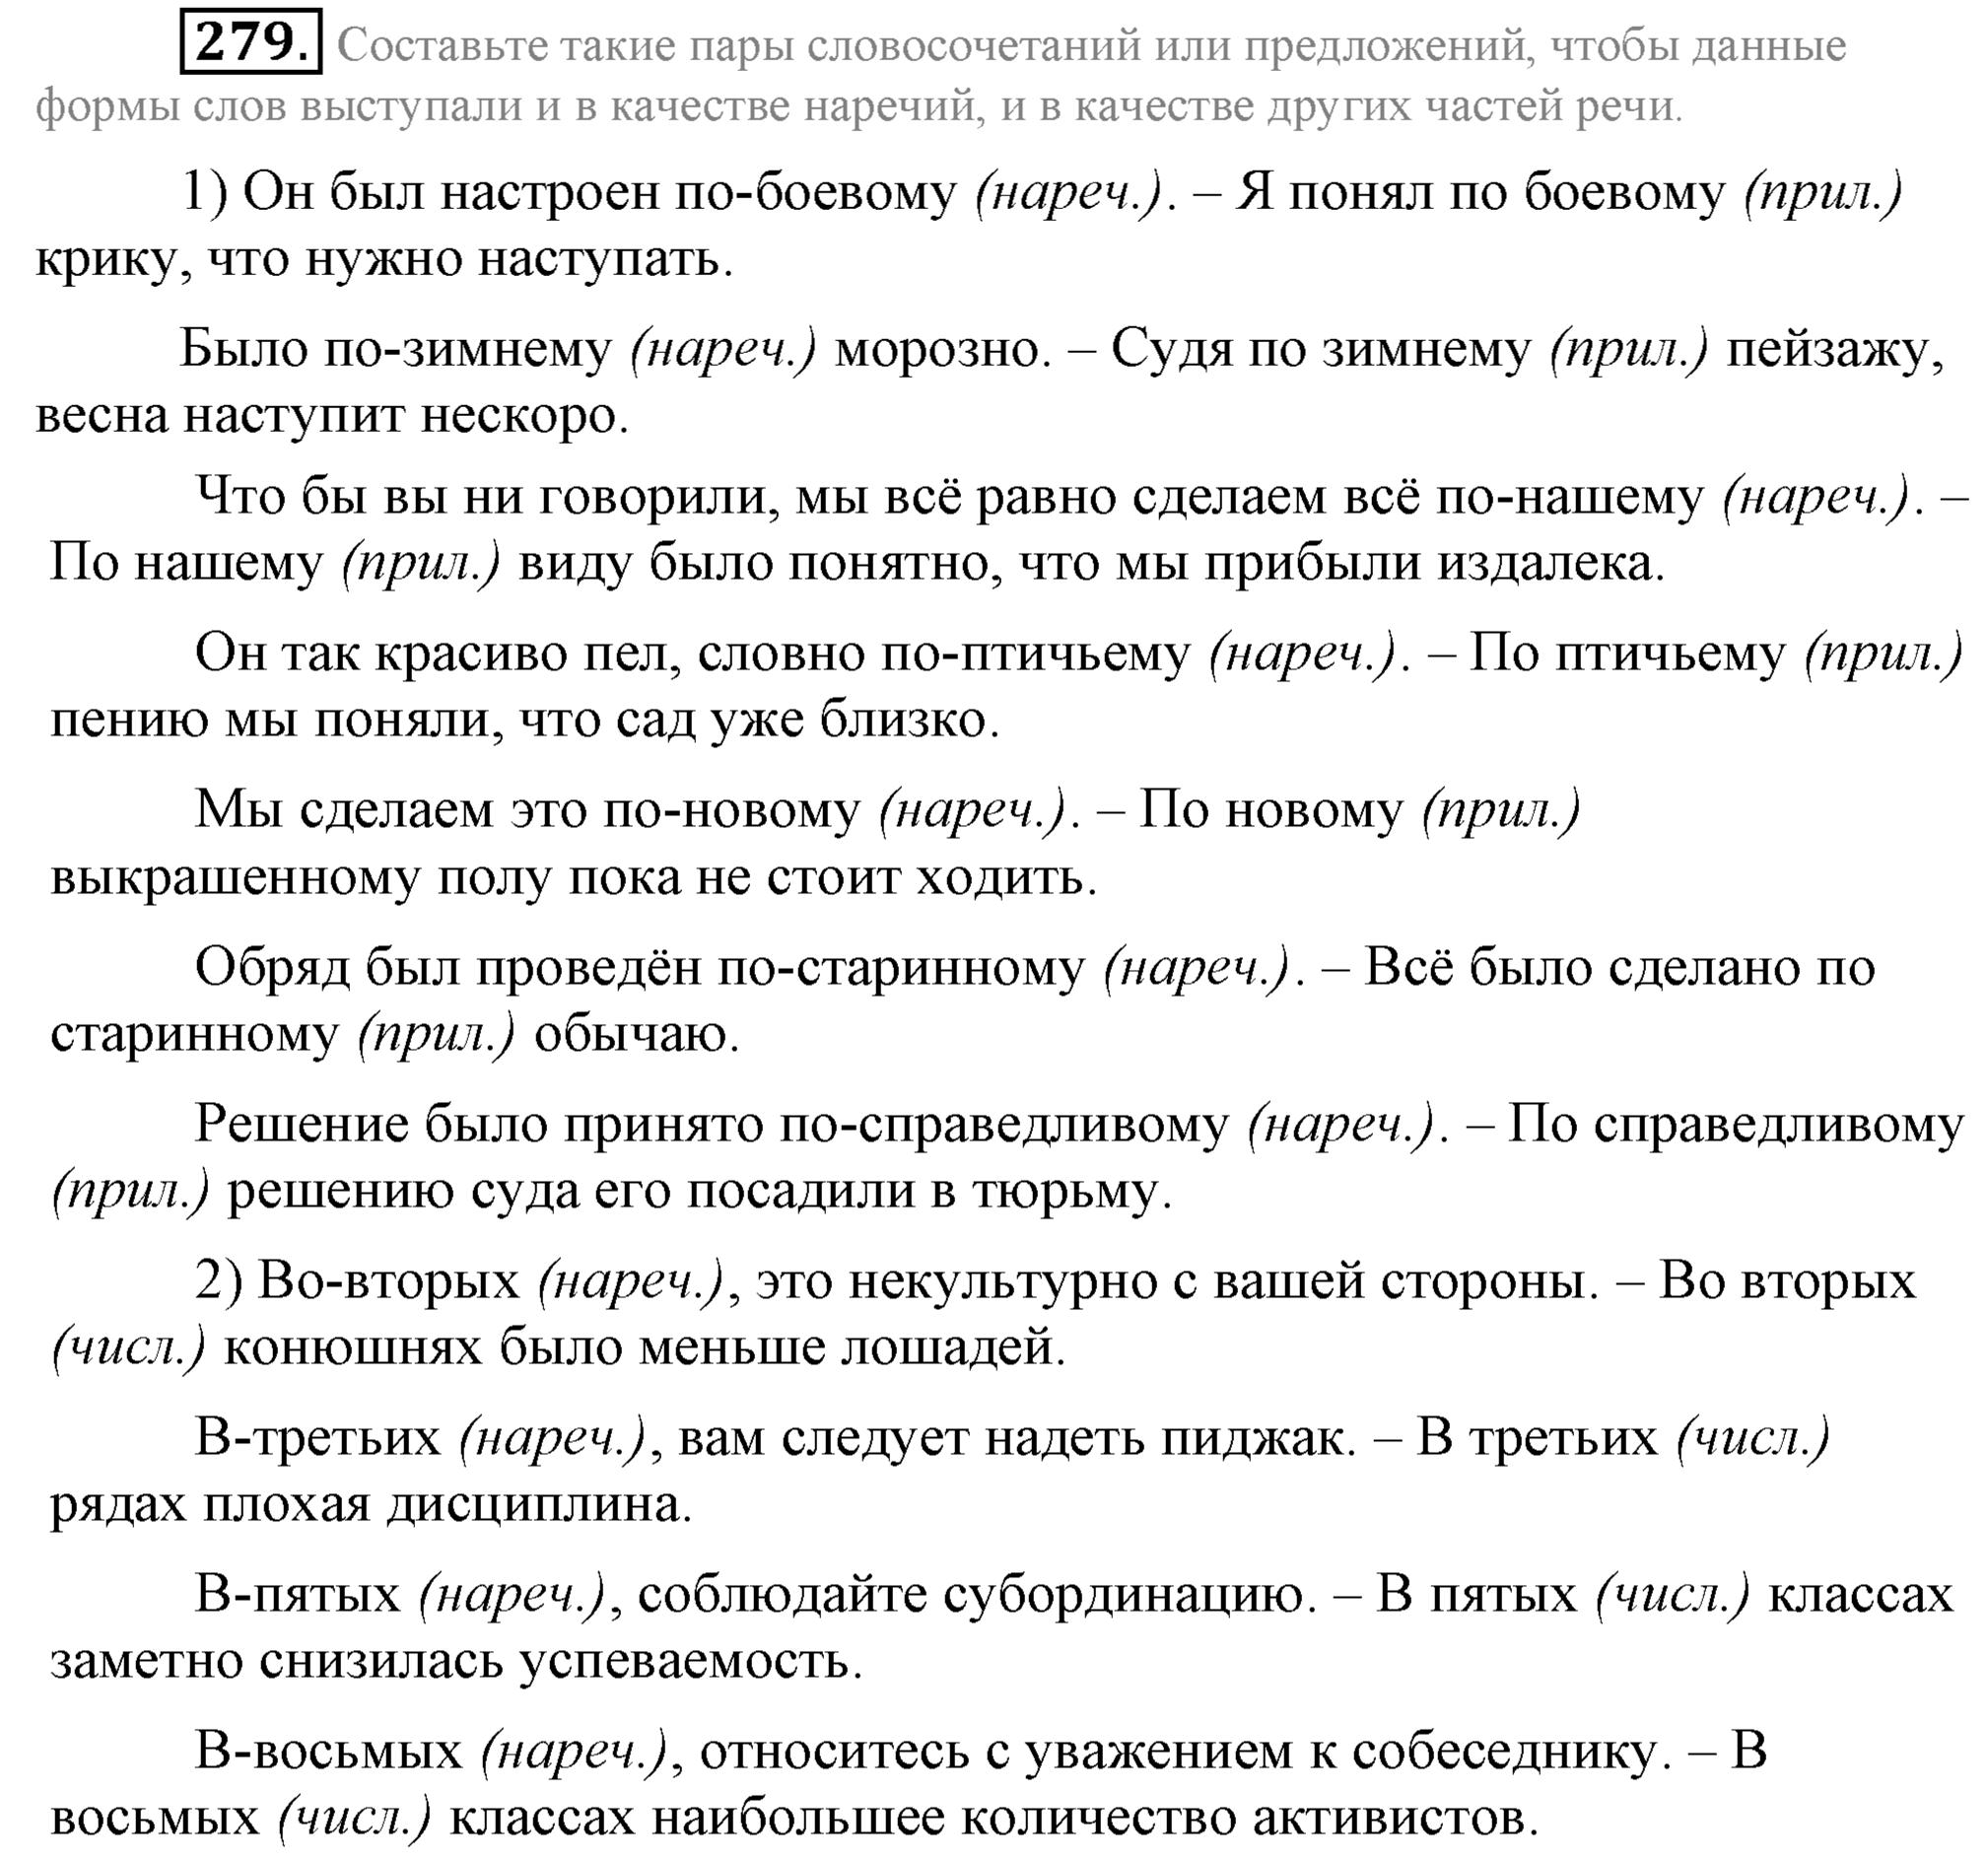 Гдз по русскому языку 7 класс мемозина